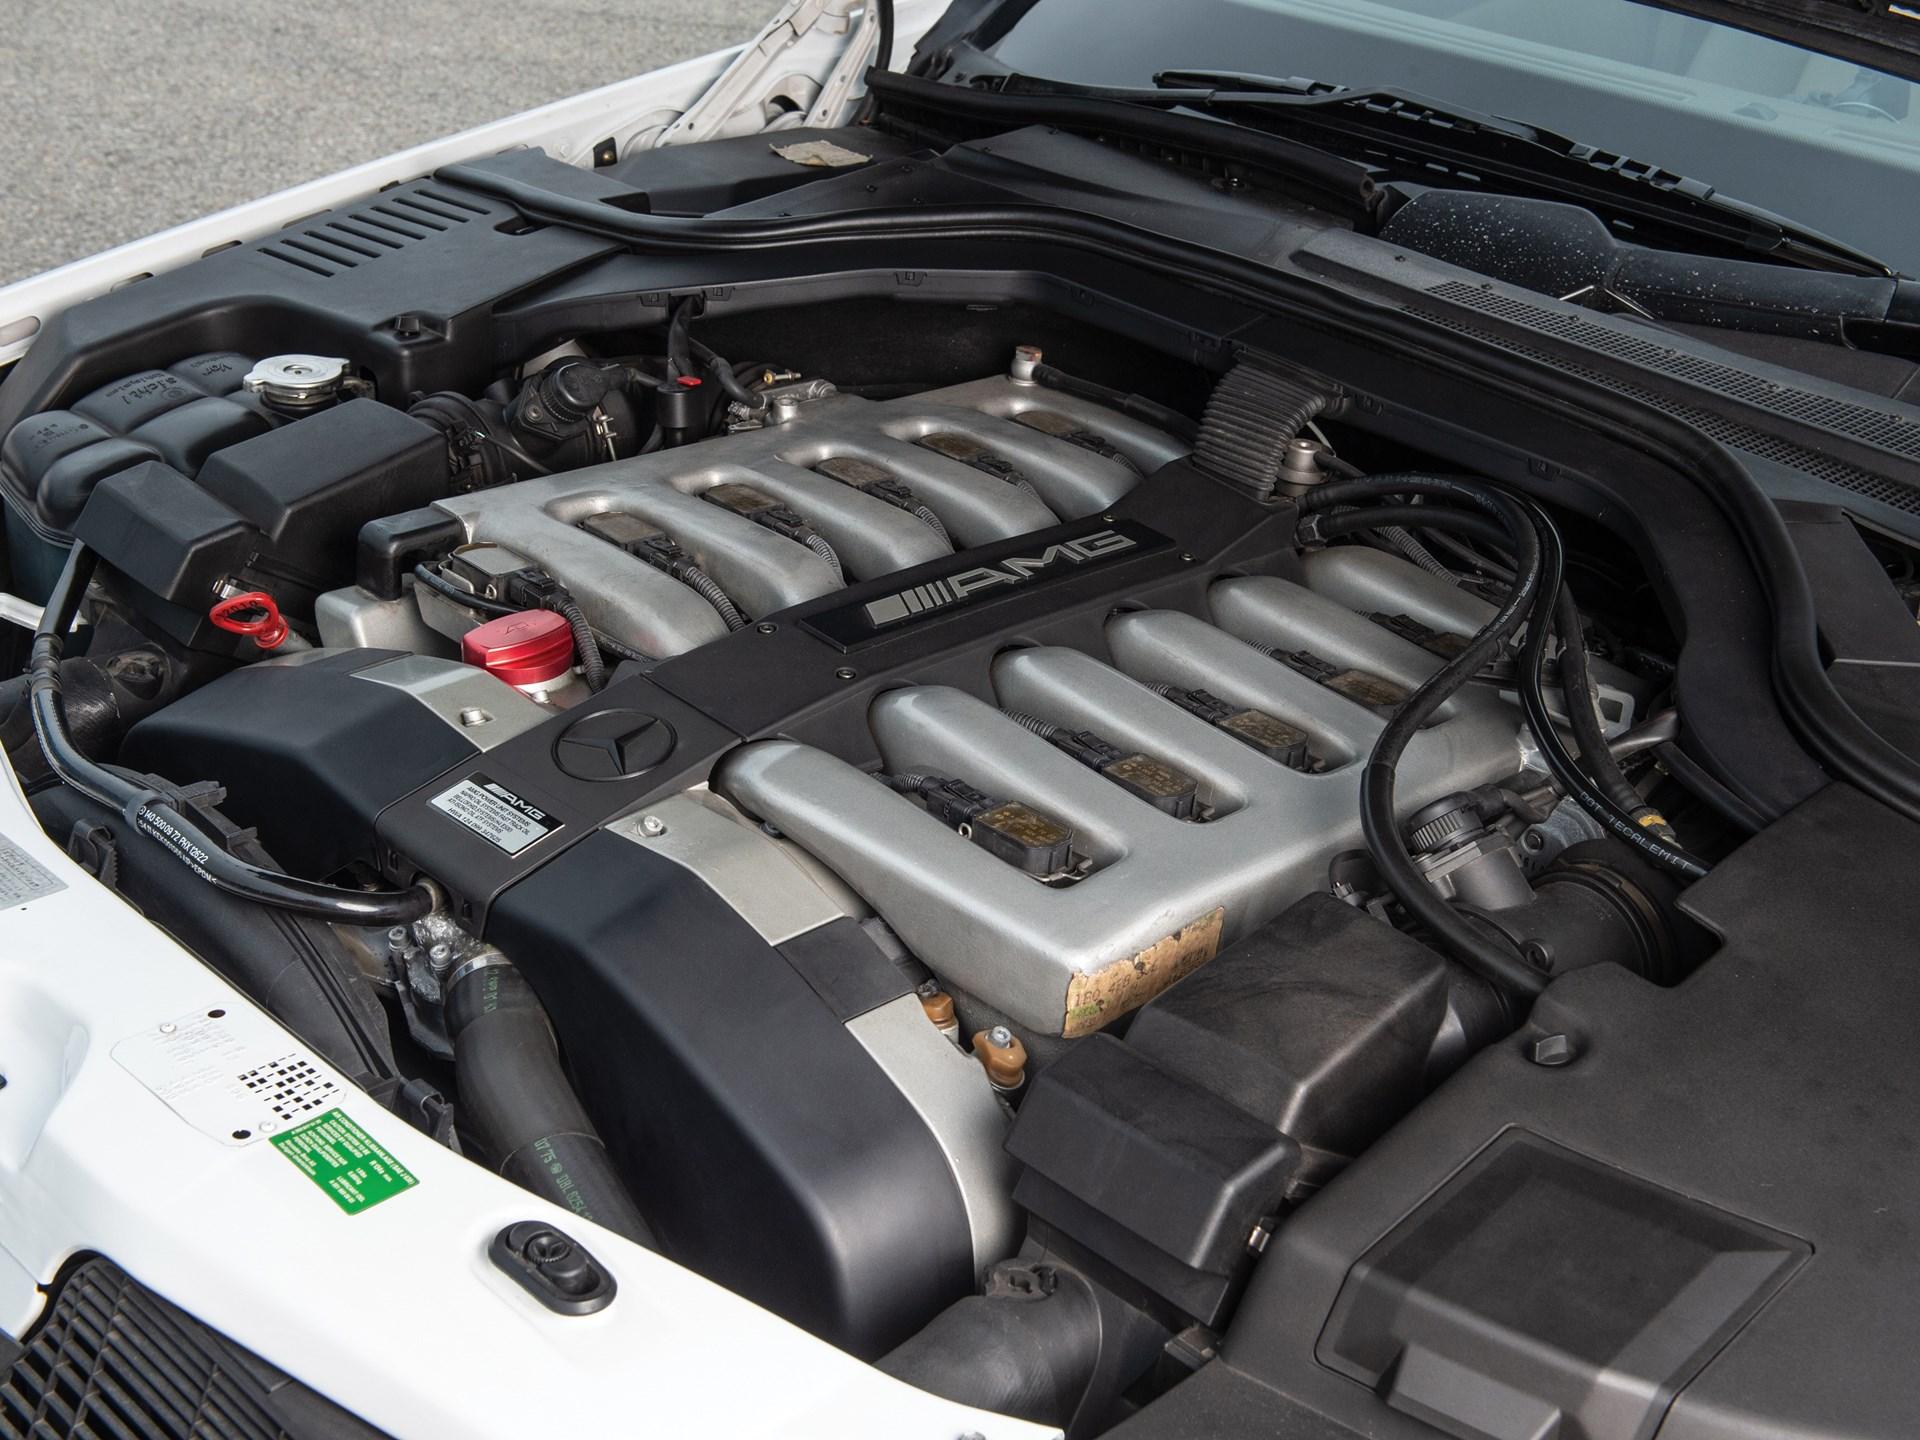 1996 mercedes s600 v12 coupe